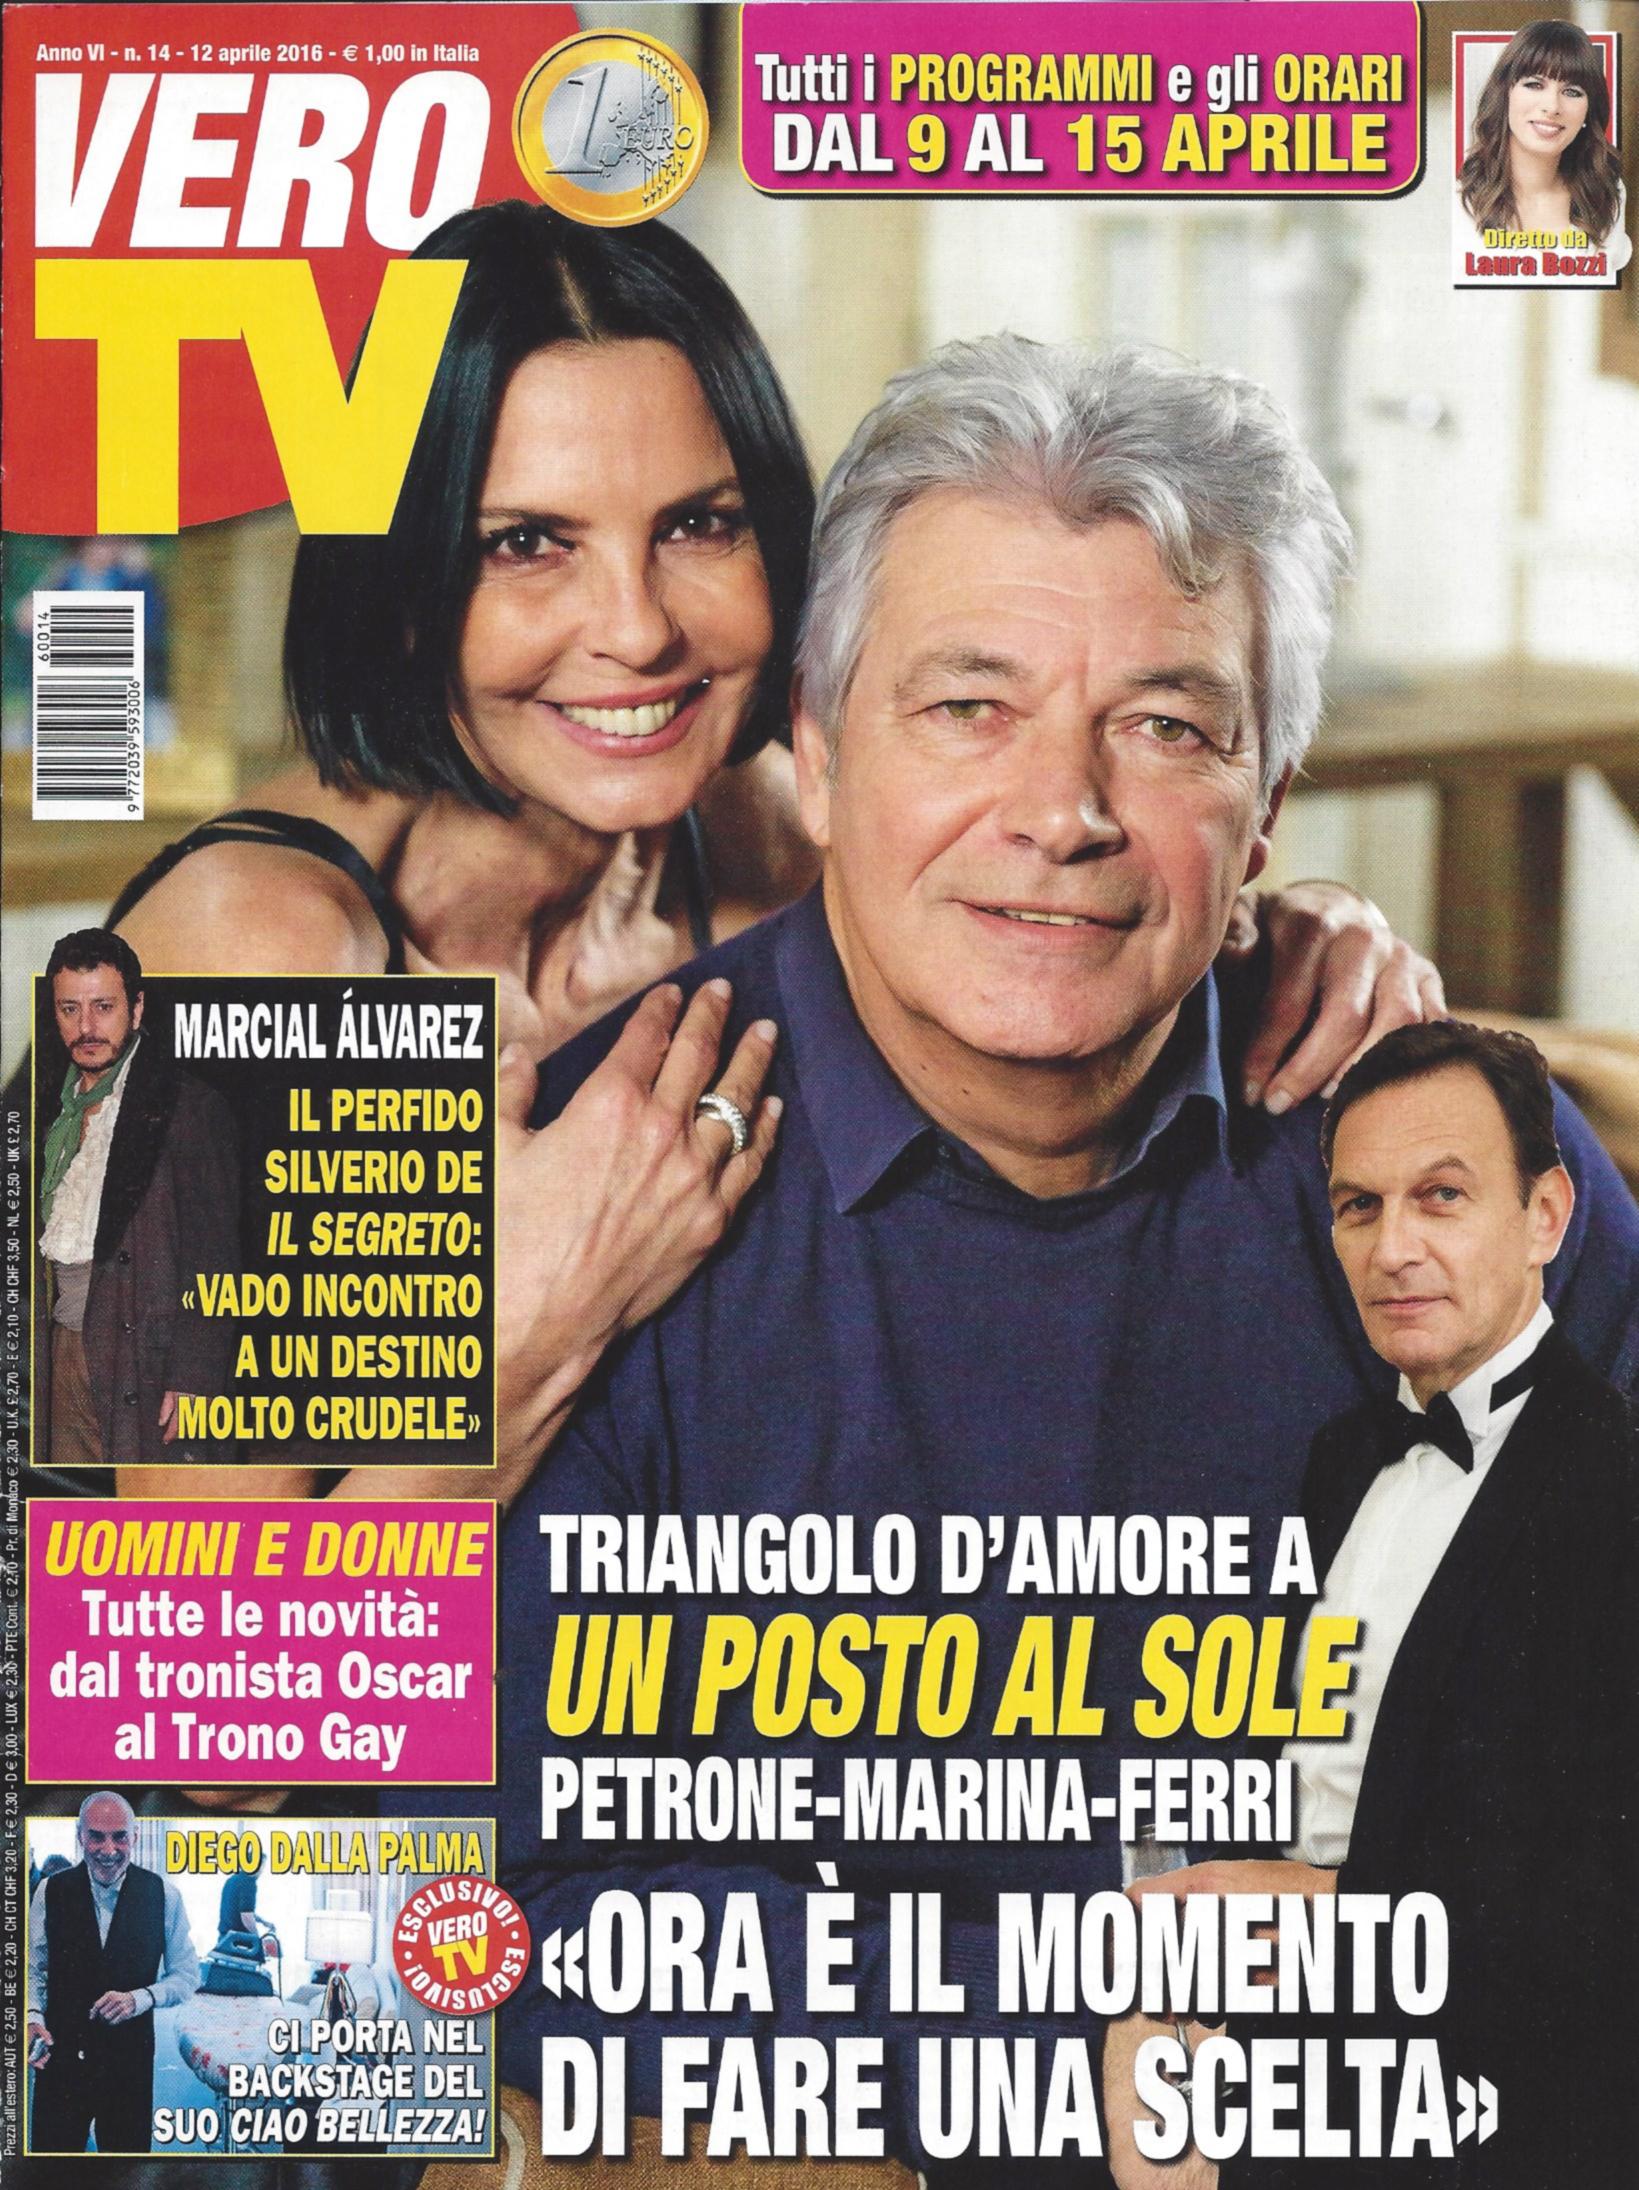 VERO-TV-9-12-APRILE-2016.jpg